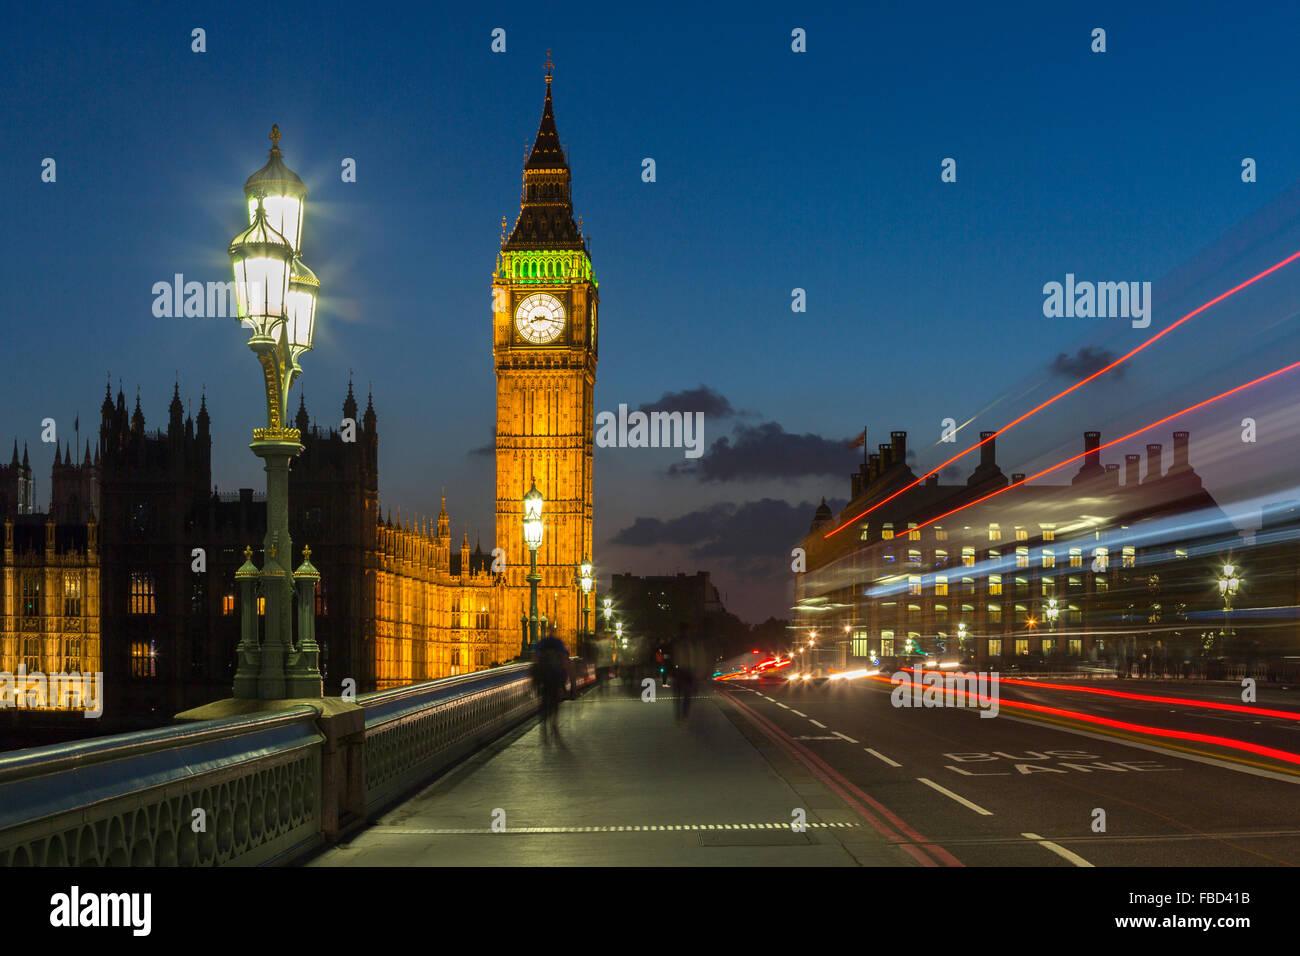 Elizabeth Tower, Big Ben, London, United Kingdom - Stock Image